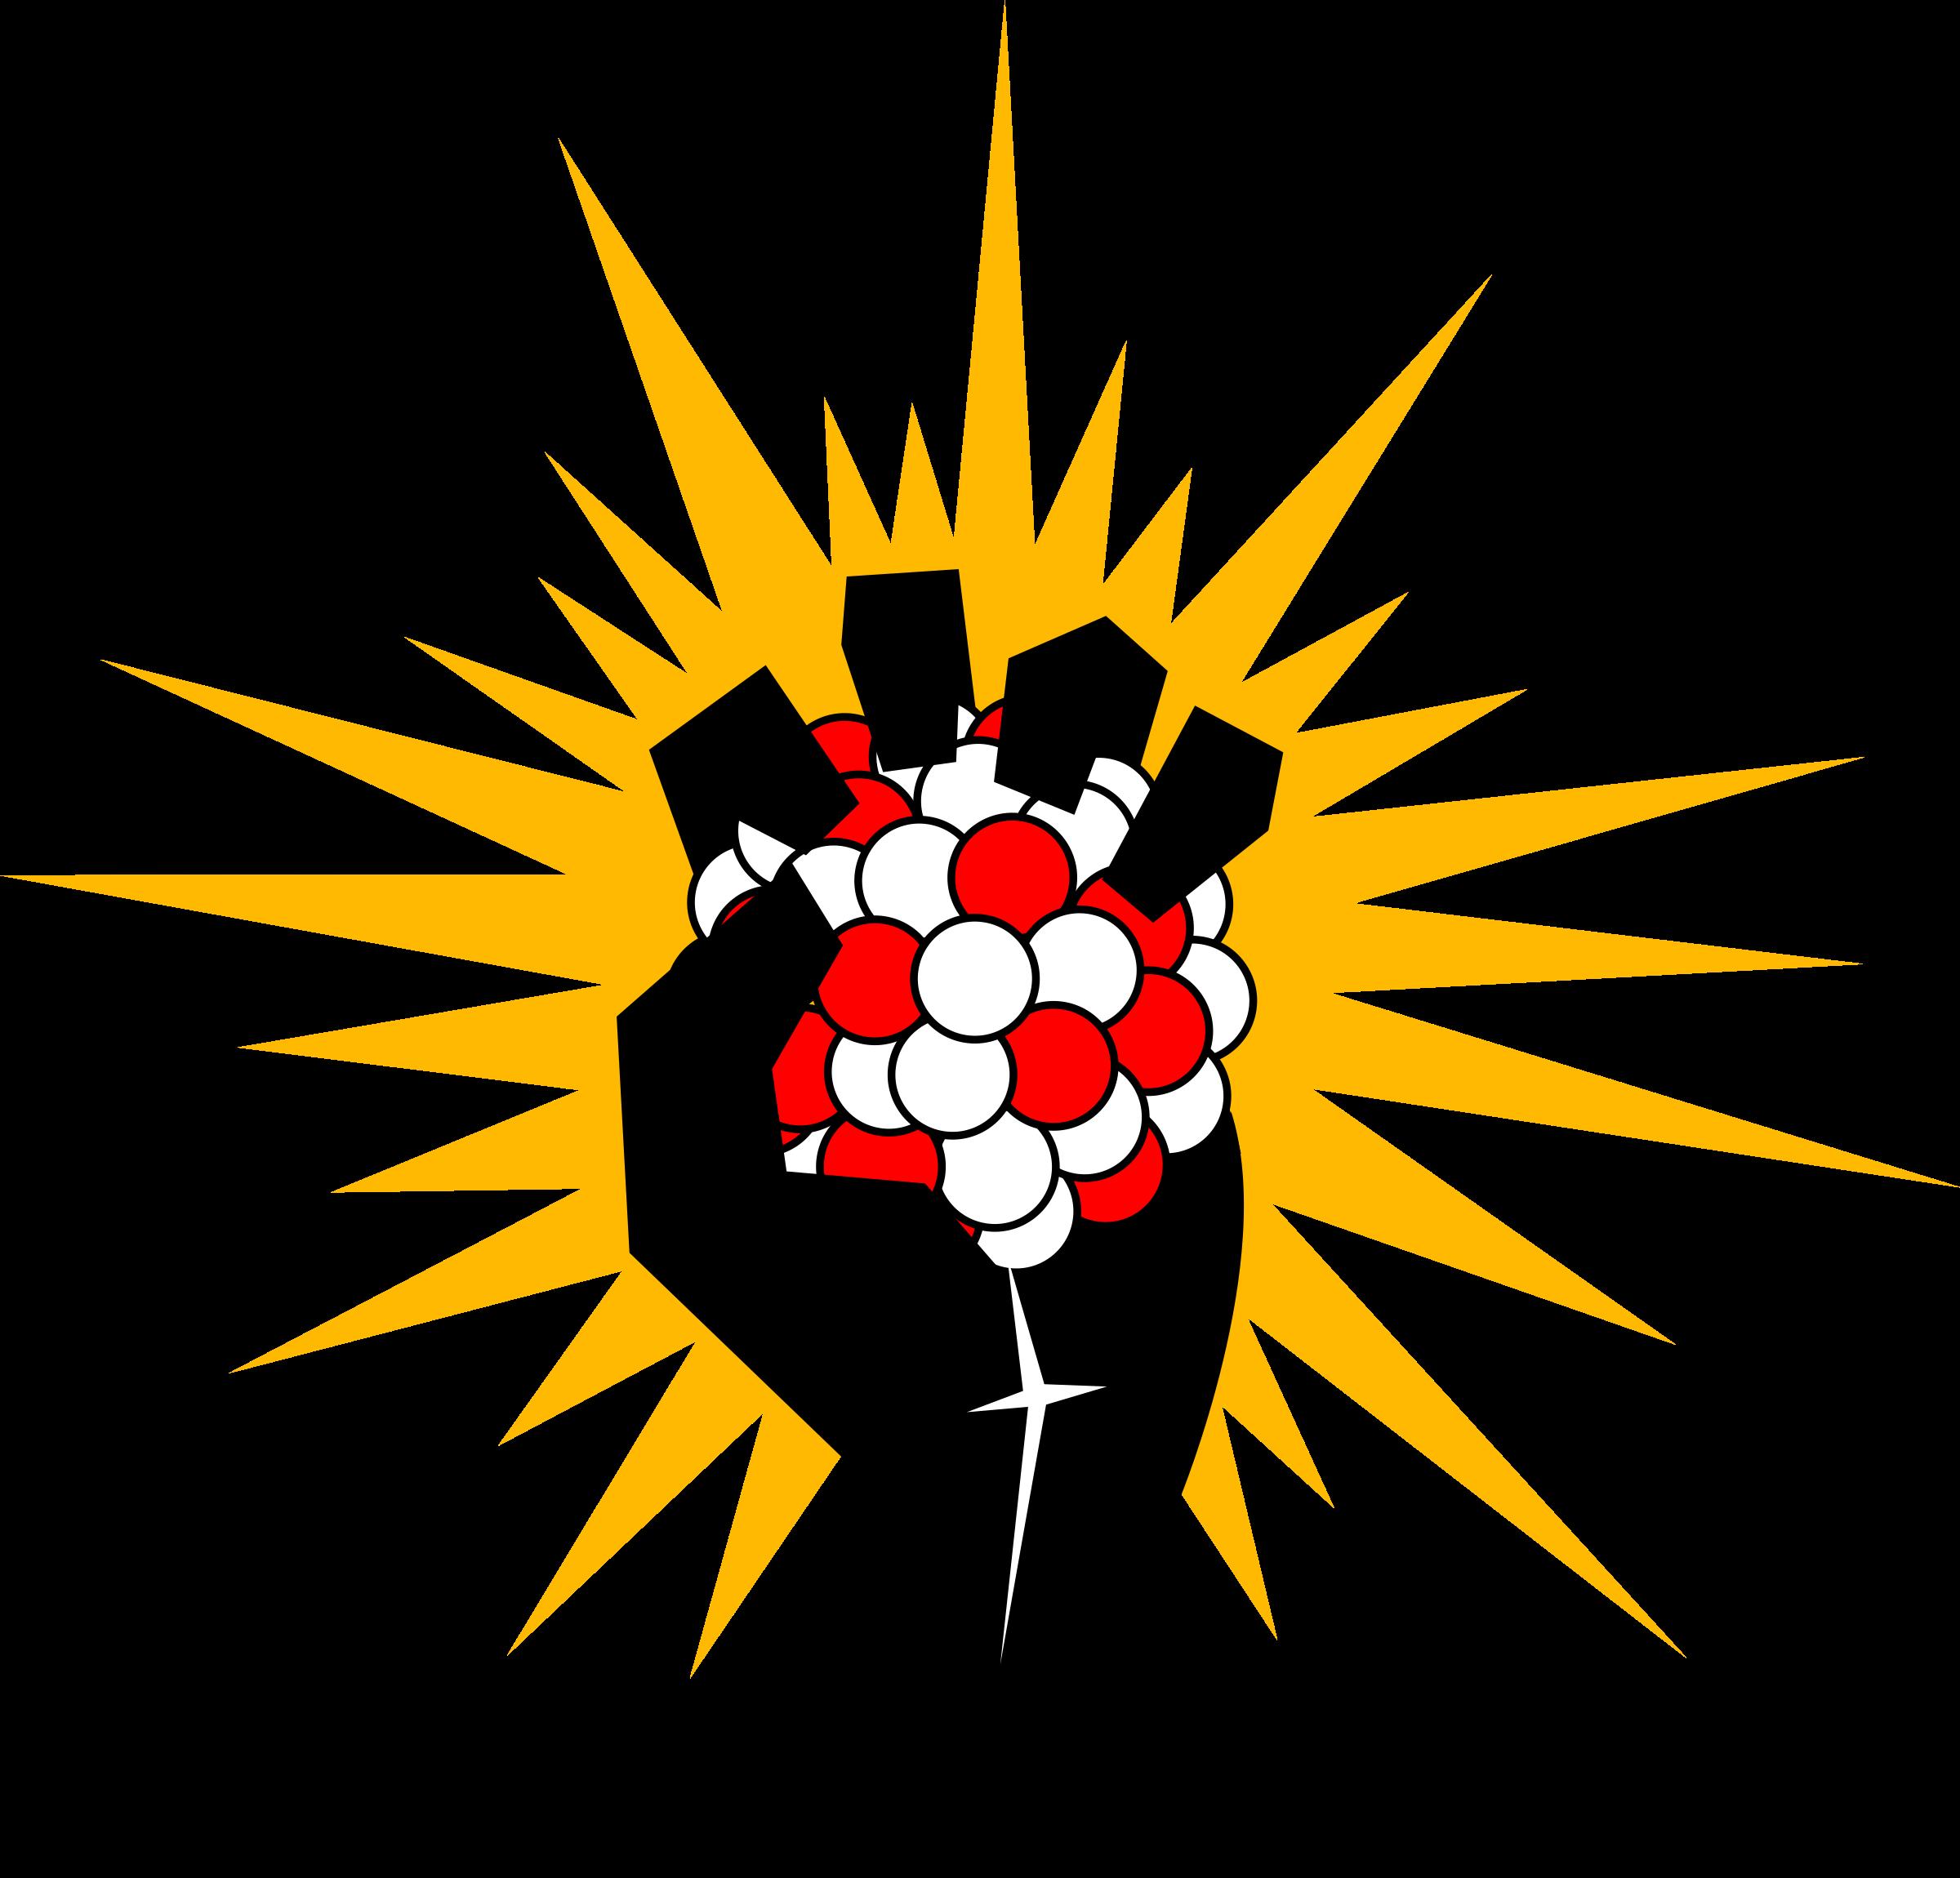 Atom clipart energy. Atomic fist big image